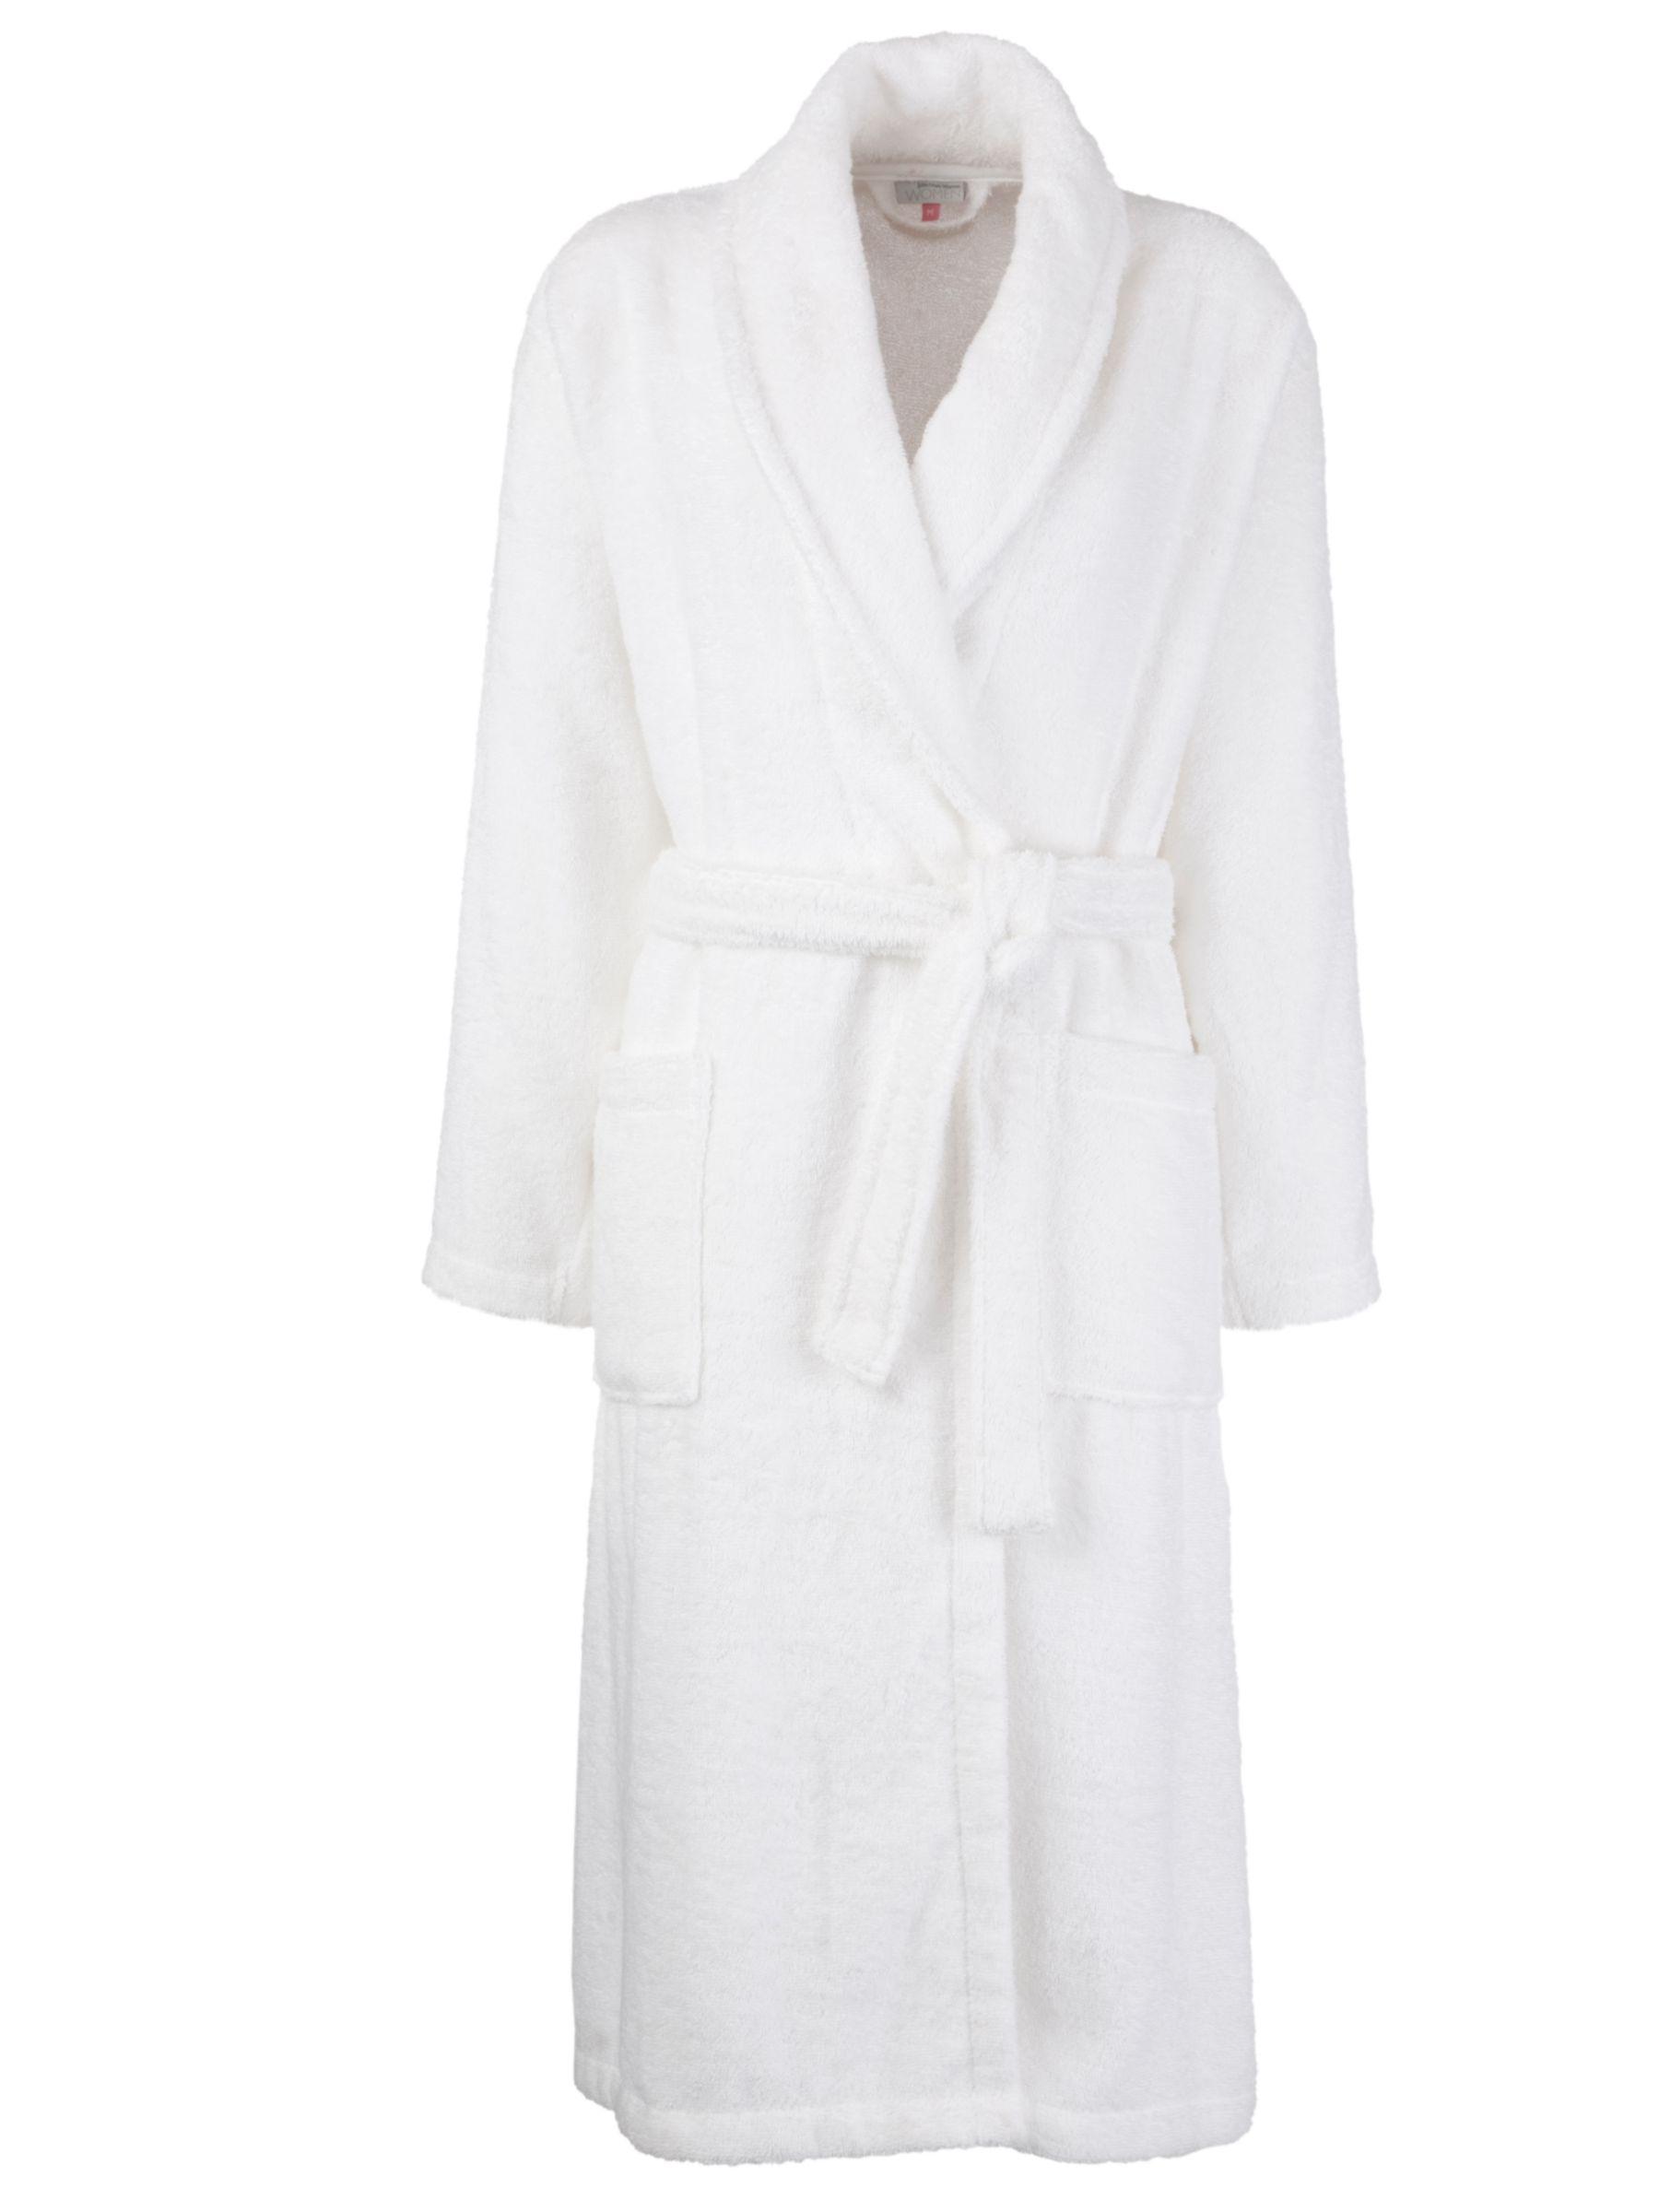 John Lewis Towelling Robe, White